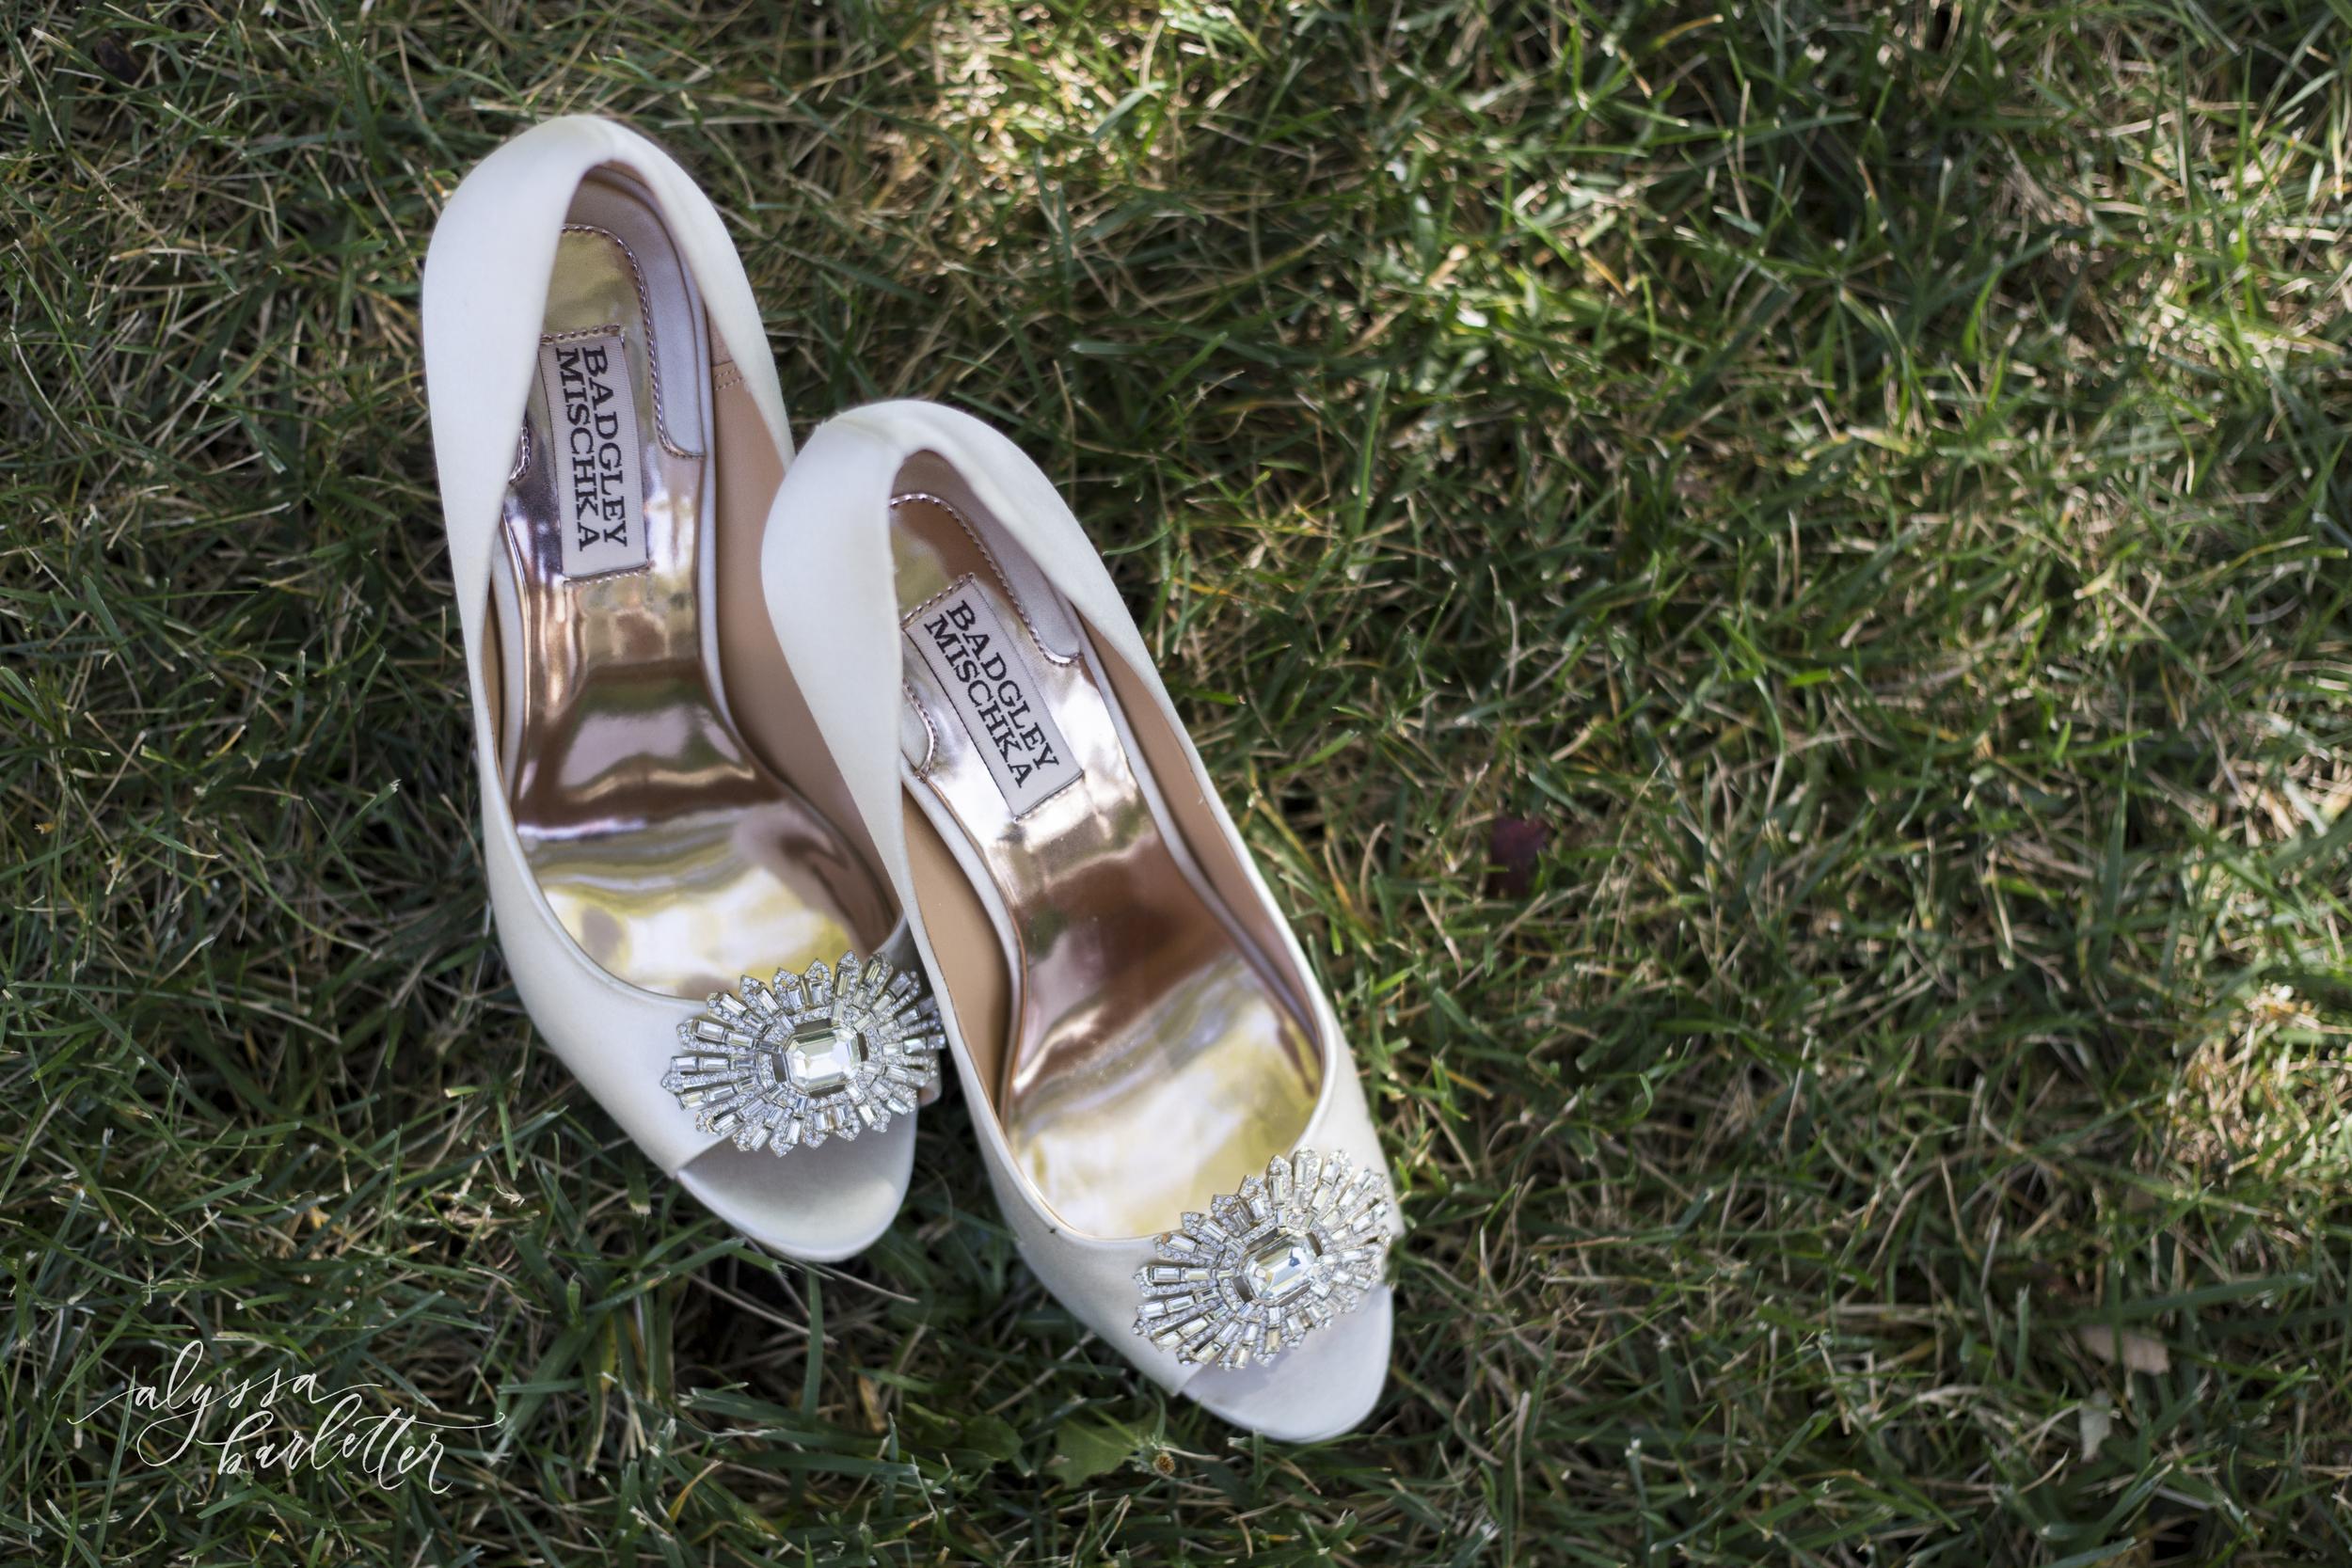 alyssa barletter photography details shoes